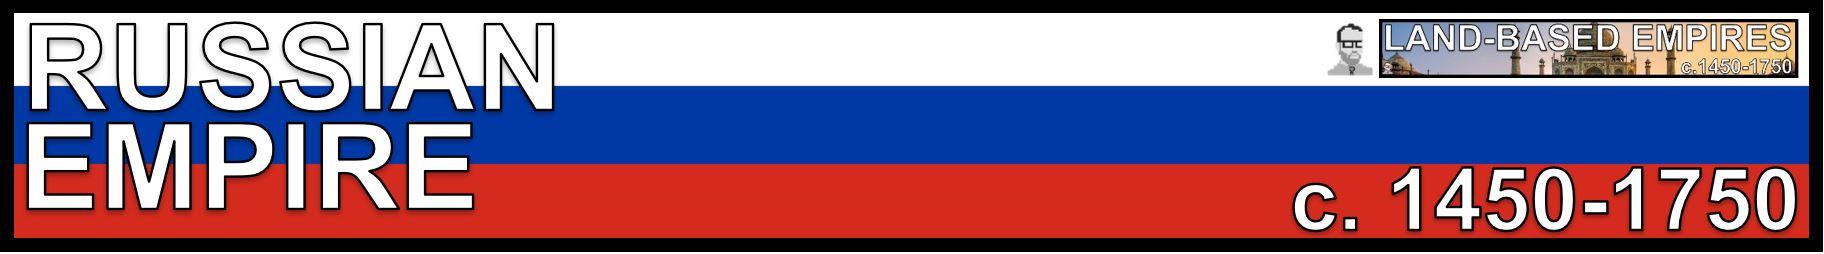 RUSSIAN BANNER LAND BASED EMPIRES AP WORLD HISTORY FREEMANPEDIA.JPG